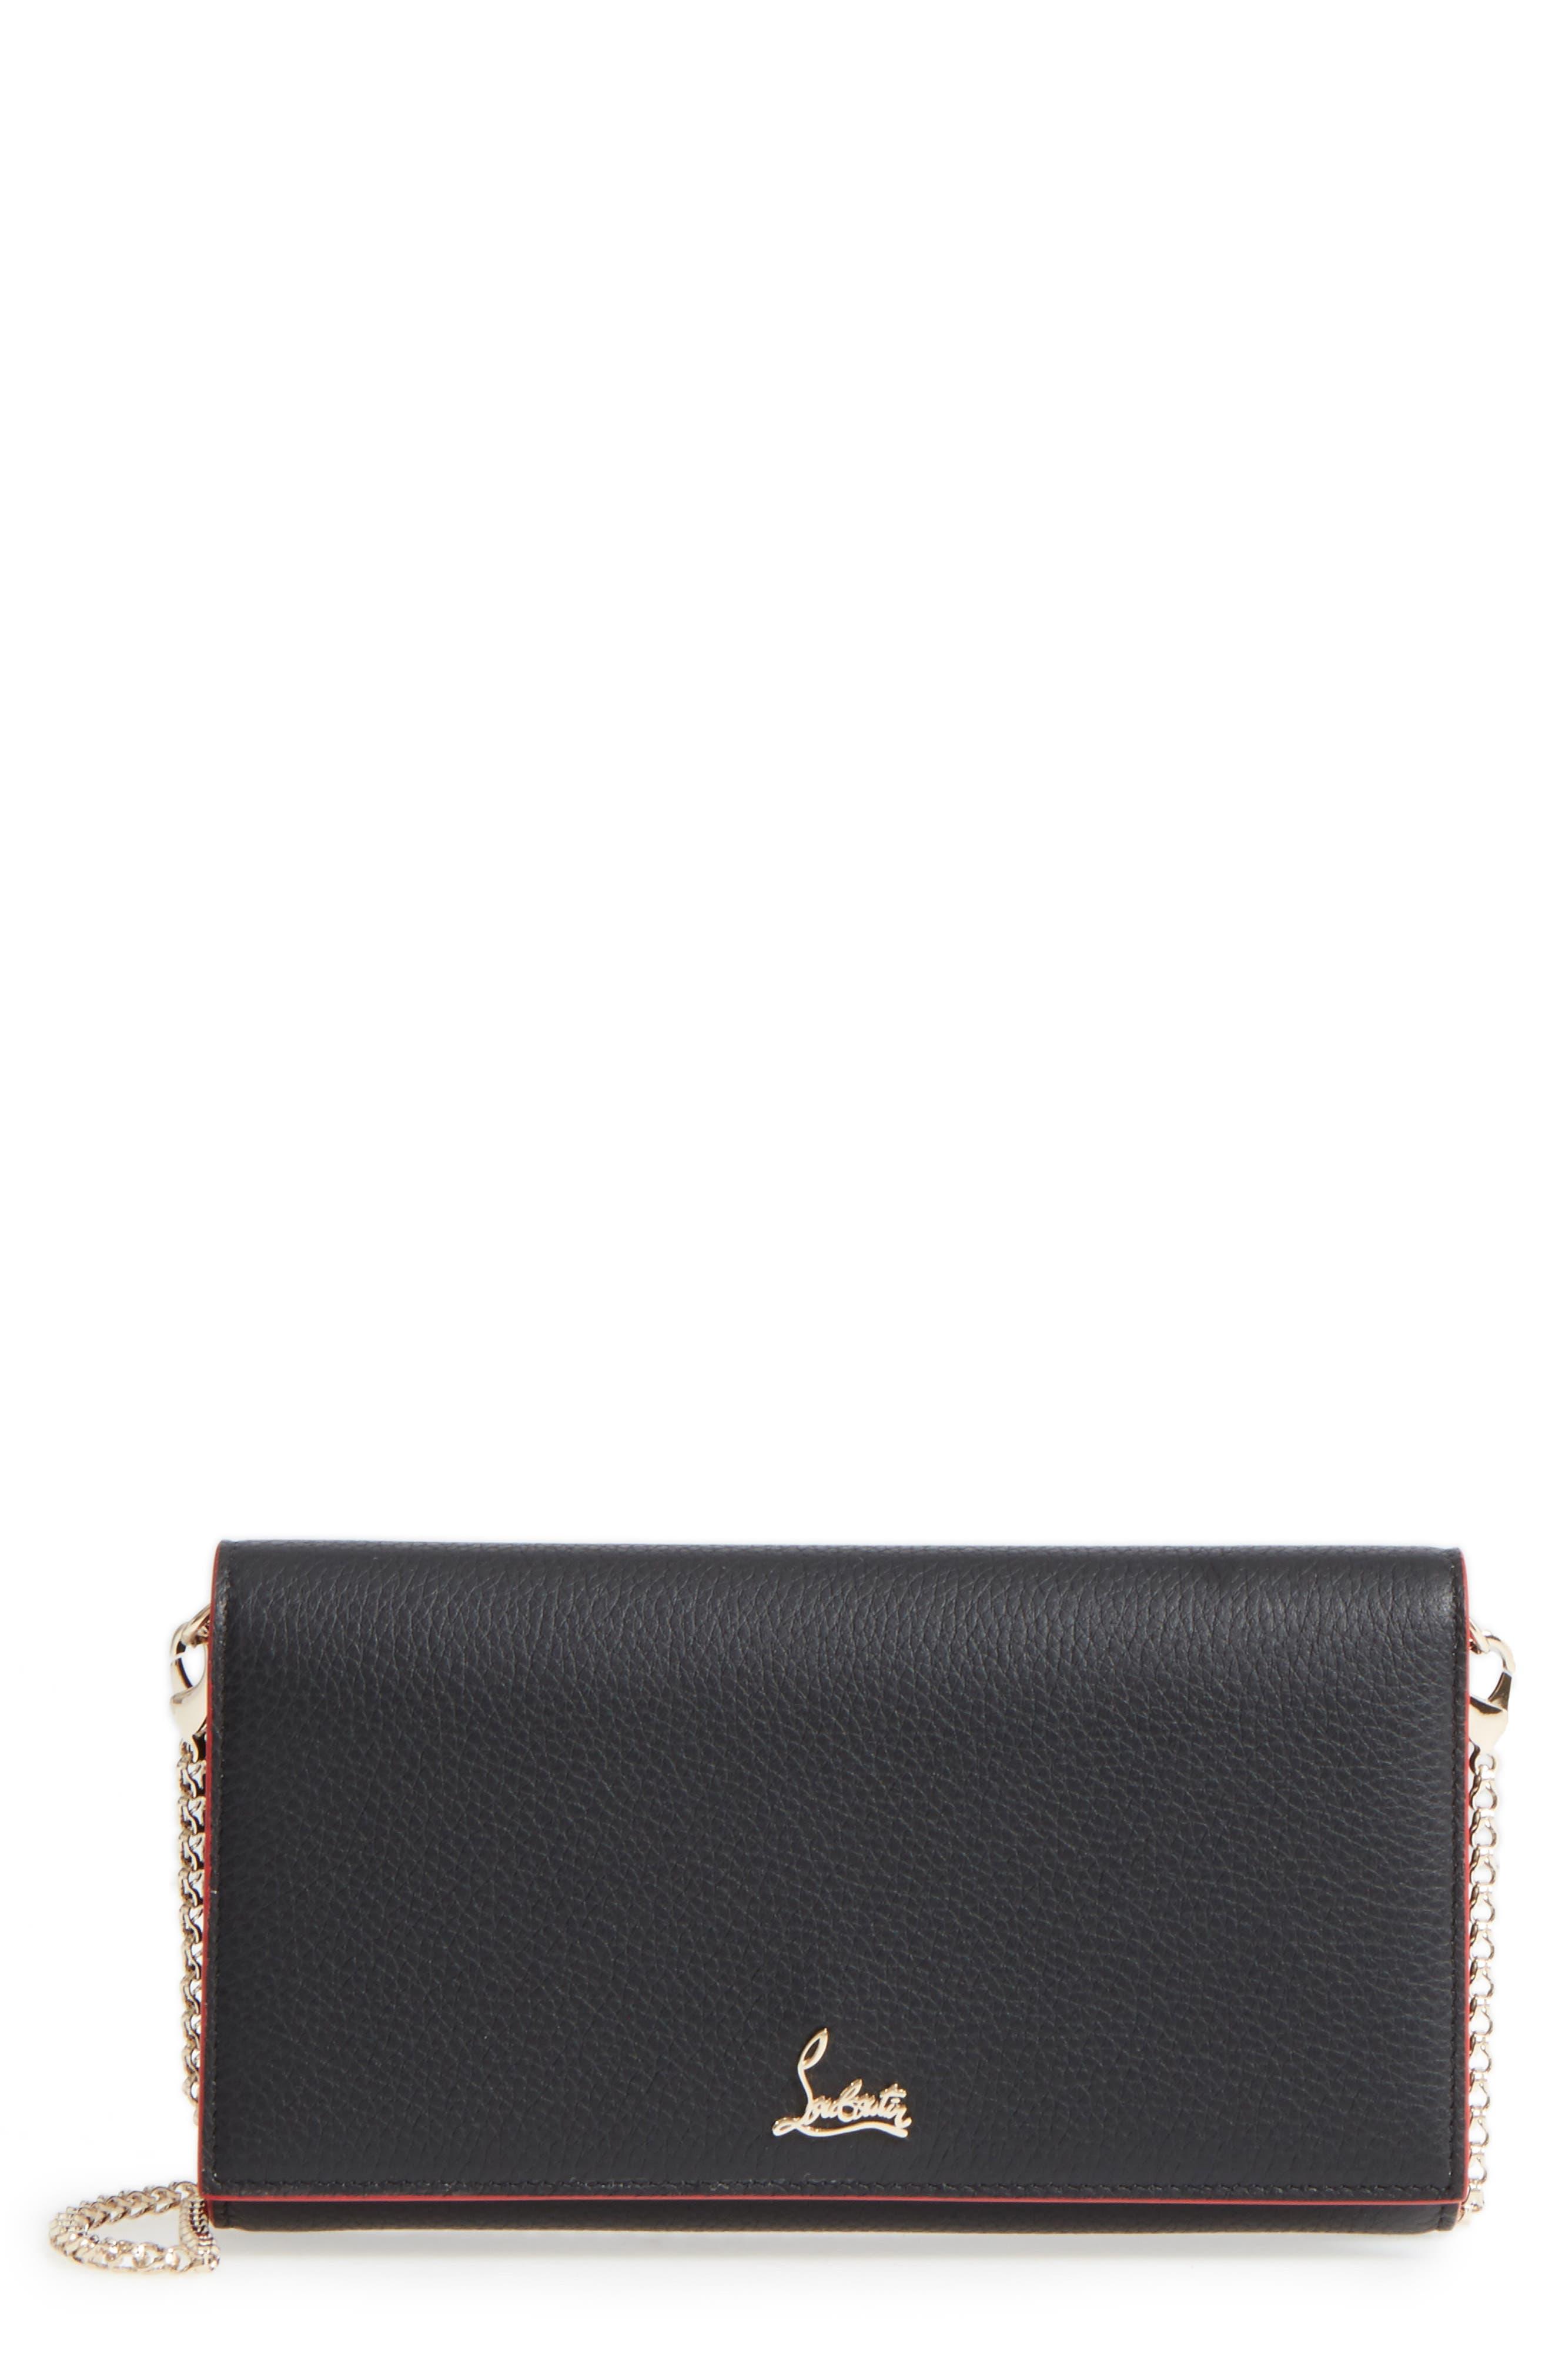 Boudoir Calfskin Leather Wallet,                         Main,                         color, BLACK/ GOLD